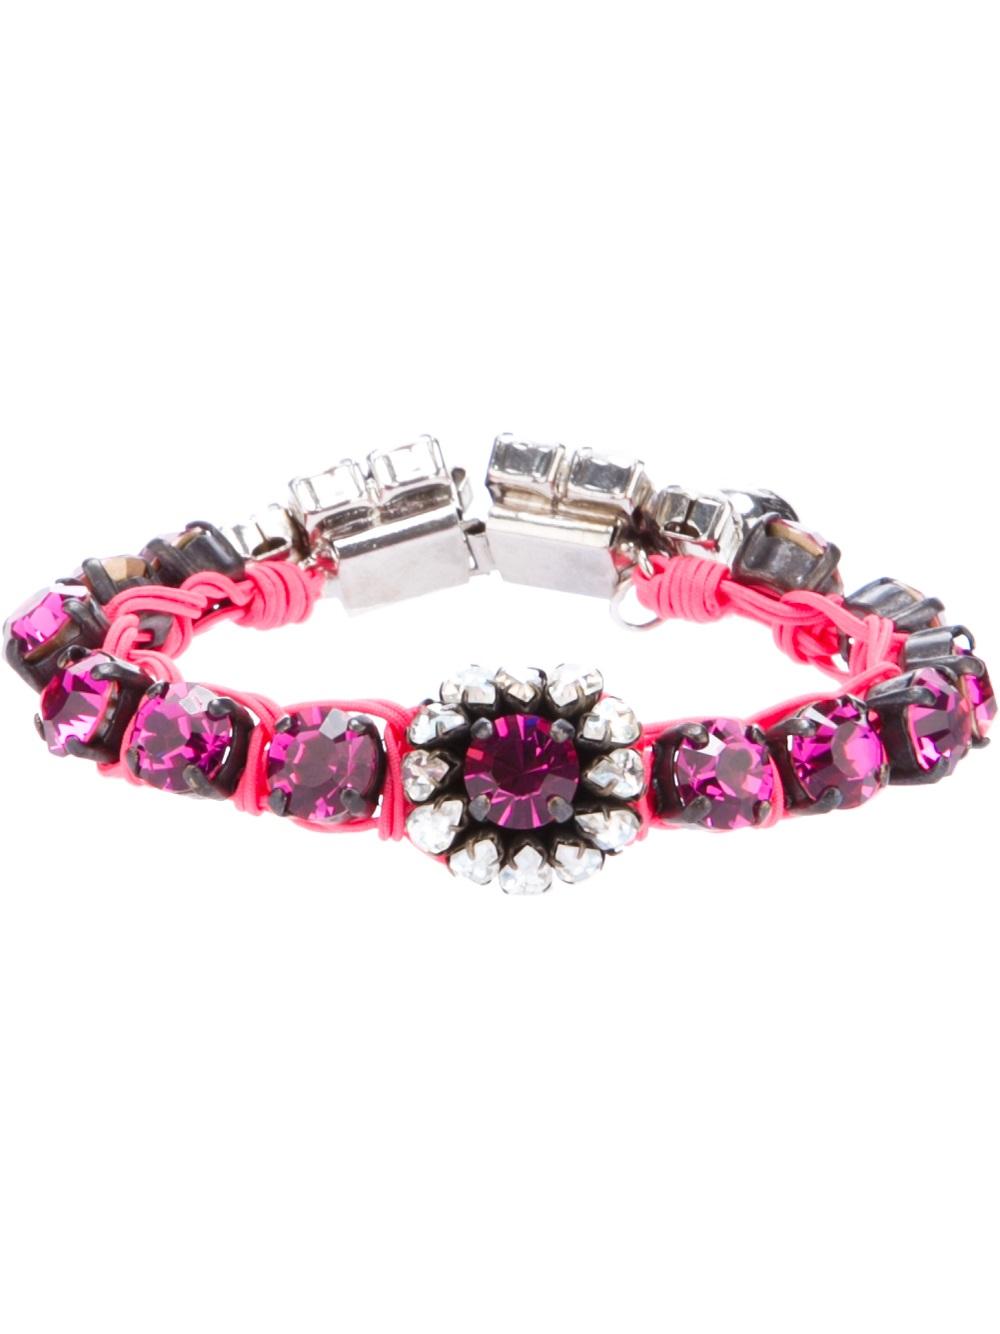 Kashmiri Fuchsia Bracelet in Pink Brass, Swarovksi Crystals and Raffia Shourouk